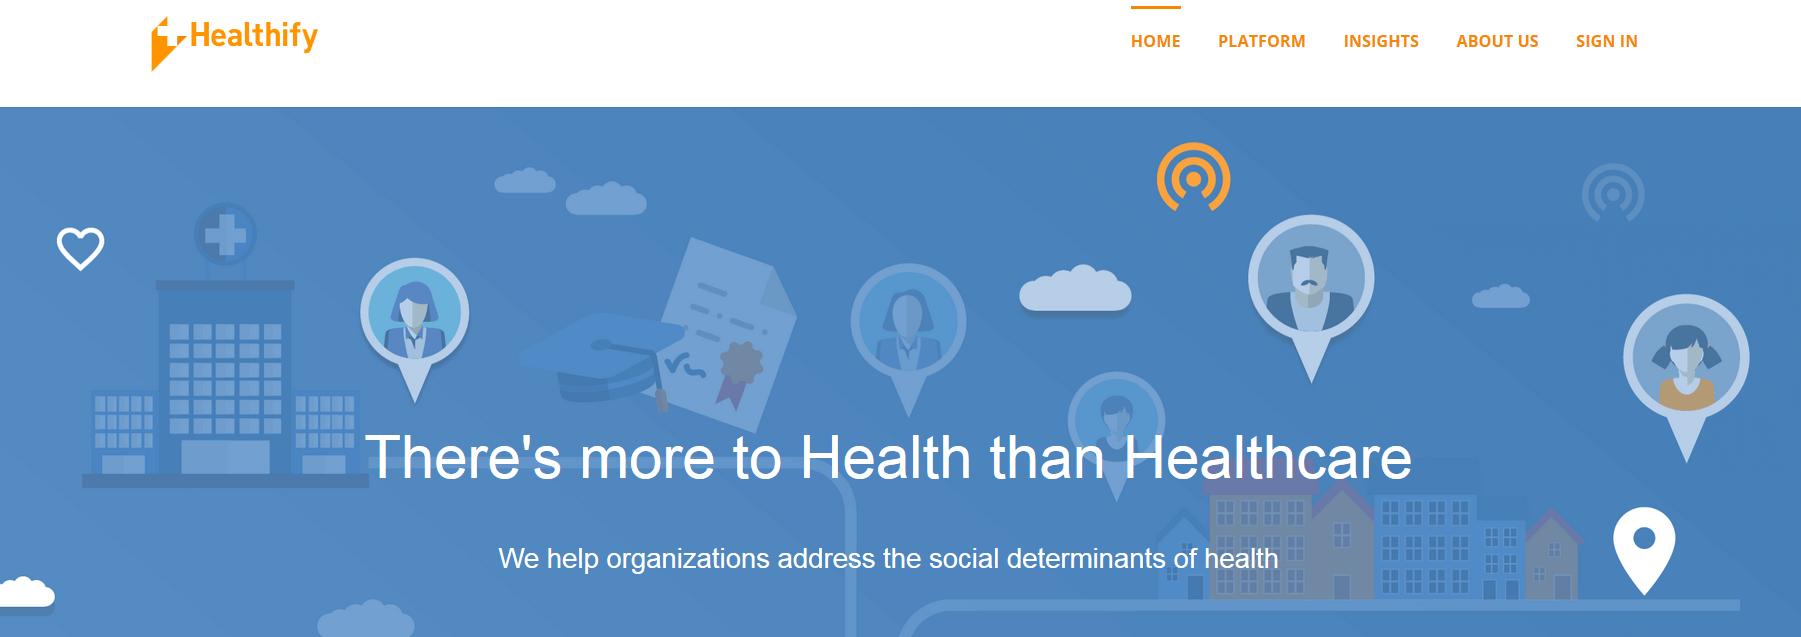 Led by BlueCross BlueShield, Healthify Raises $6.5M for Social Determinants Management Platform